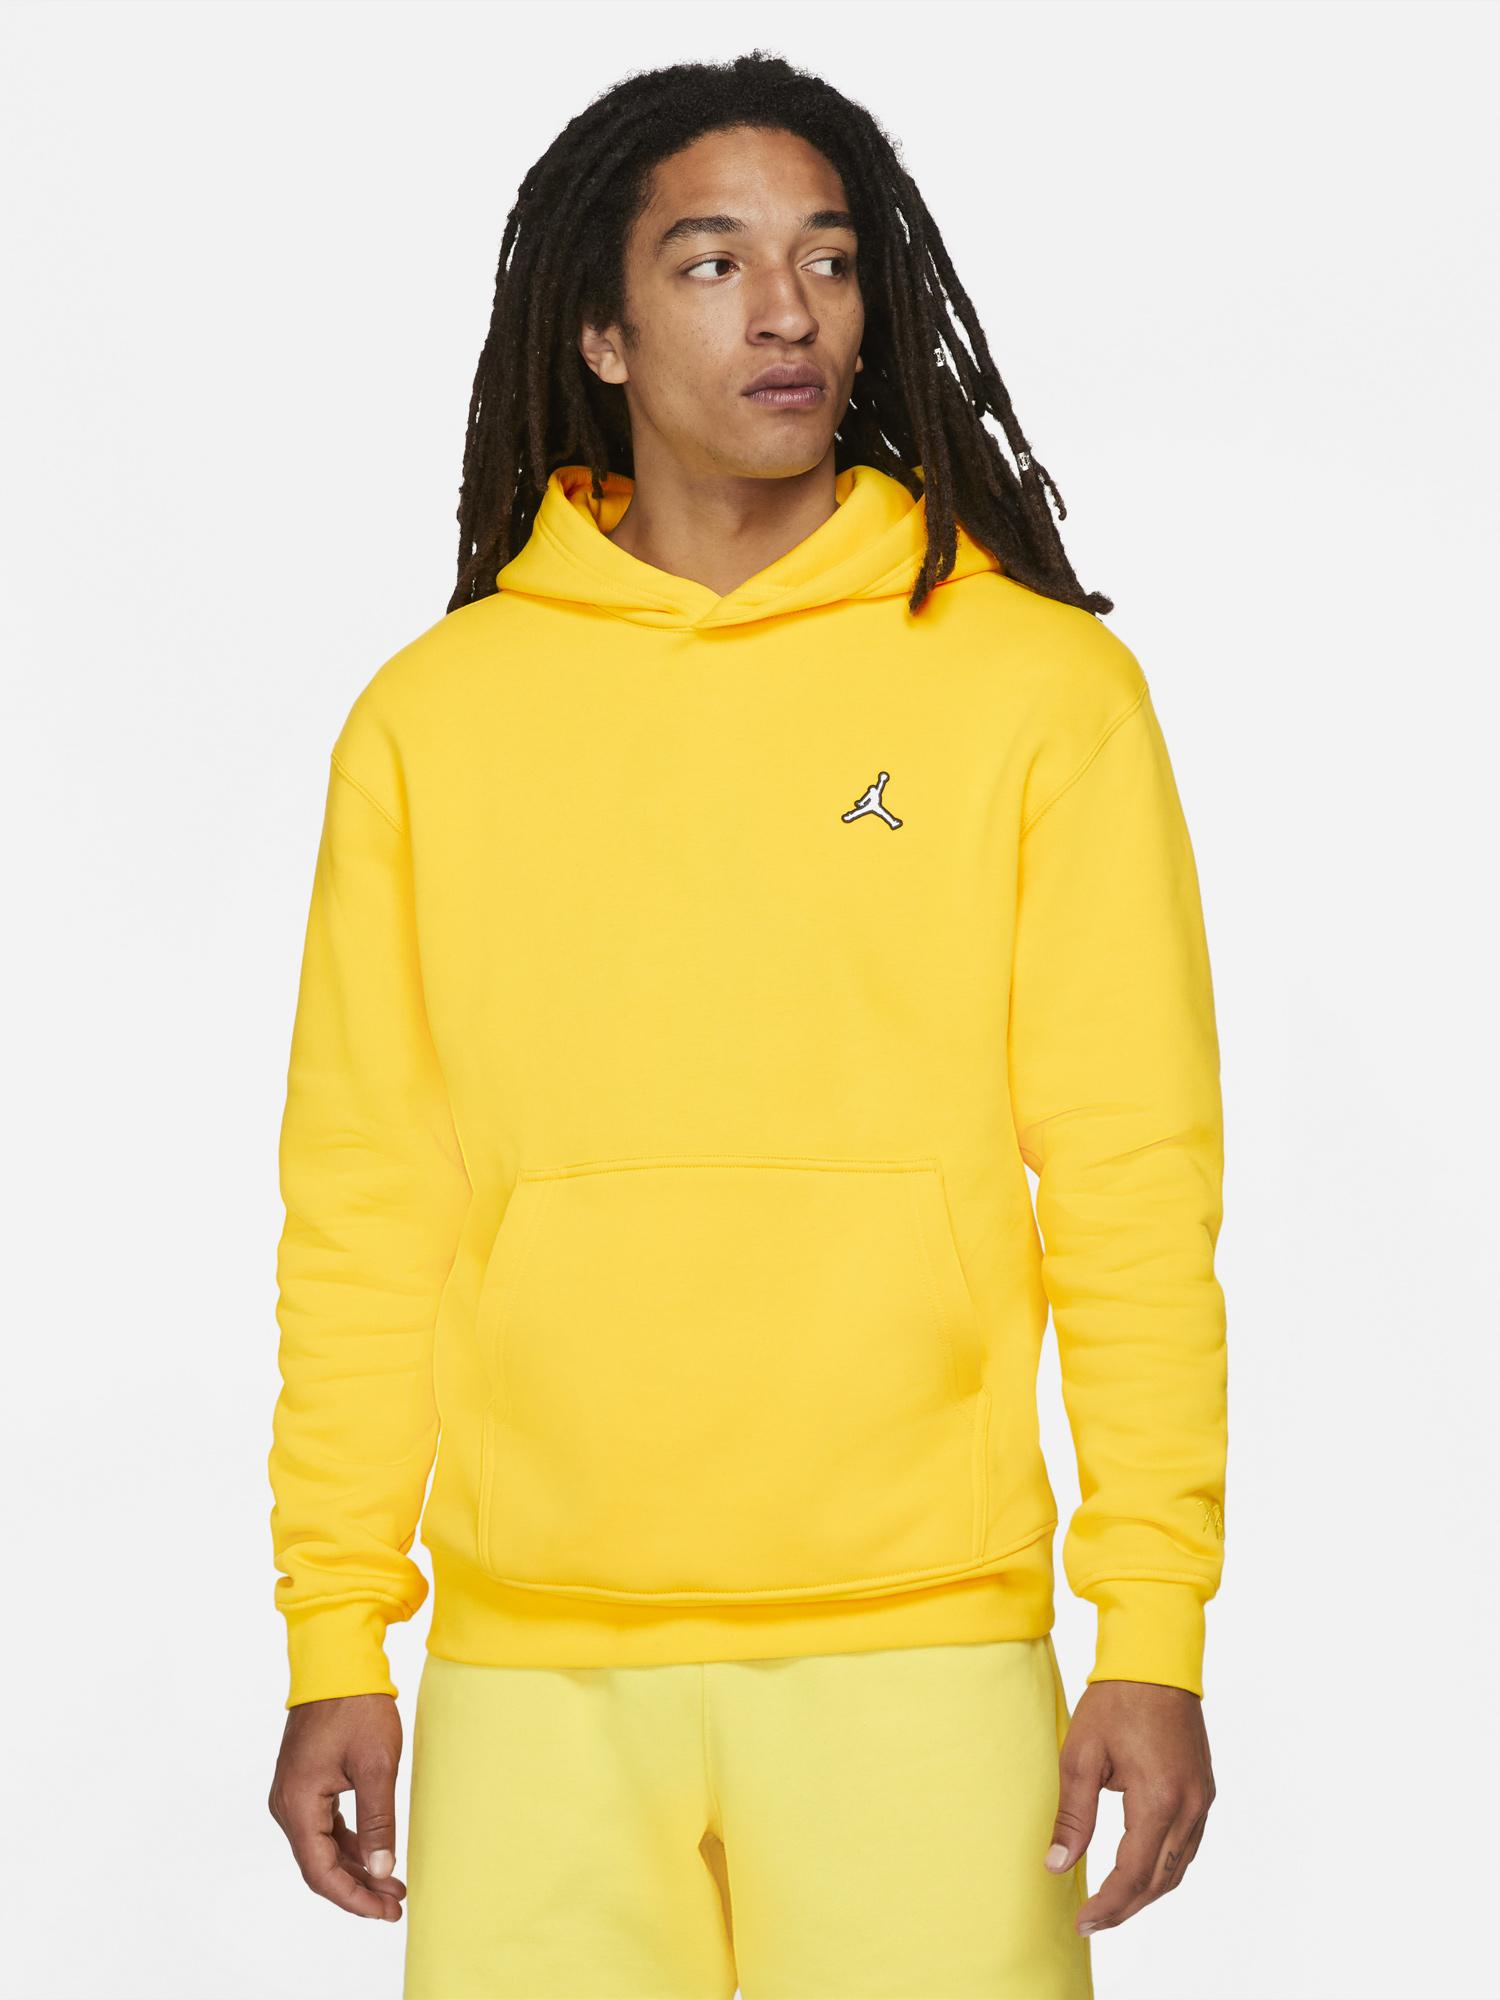 air-jordan-4-lightning-yellow-hoodie